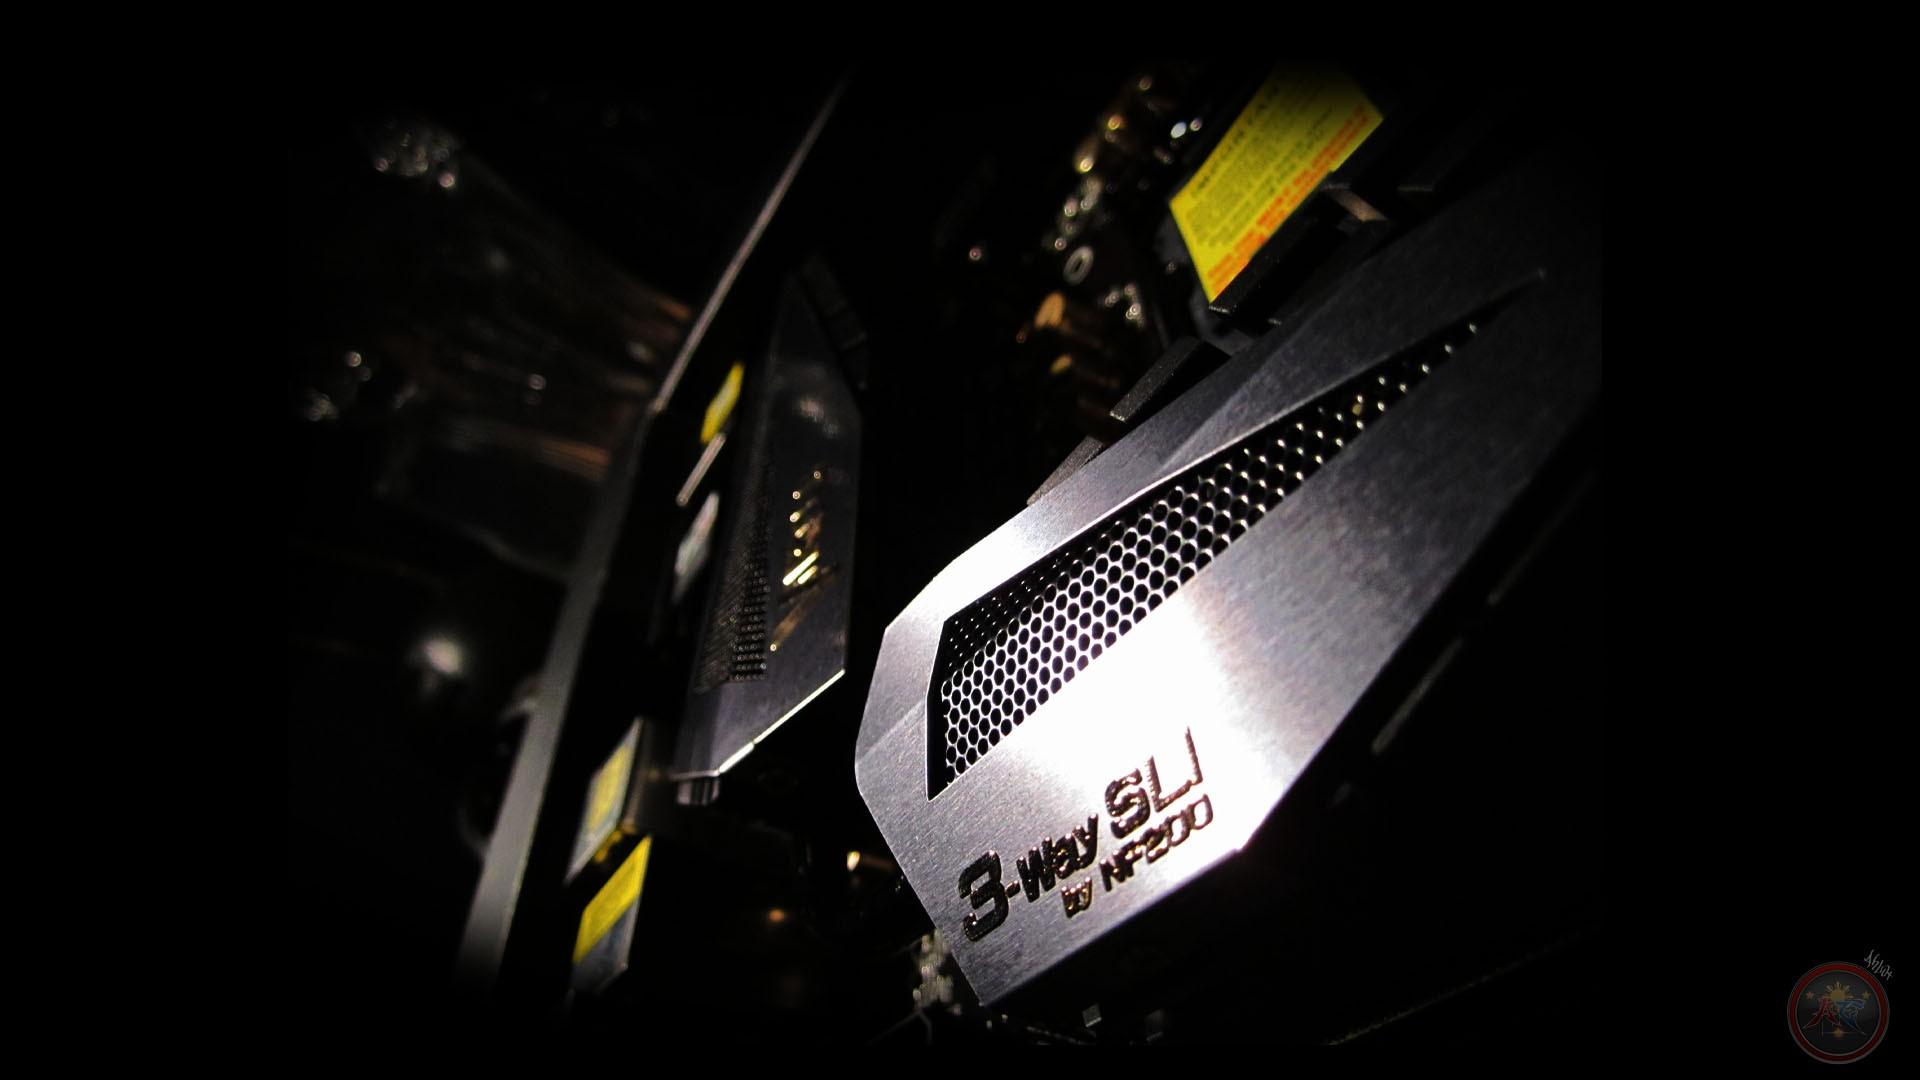 nvidia wallpaper 1600x900 - photo #22